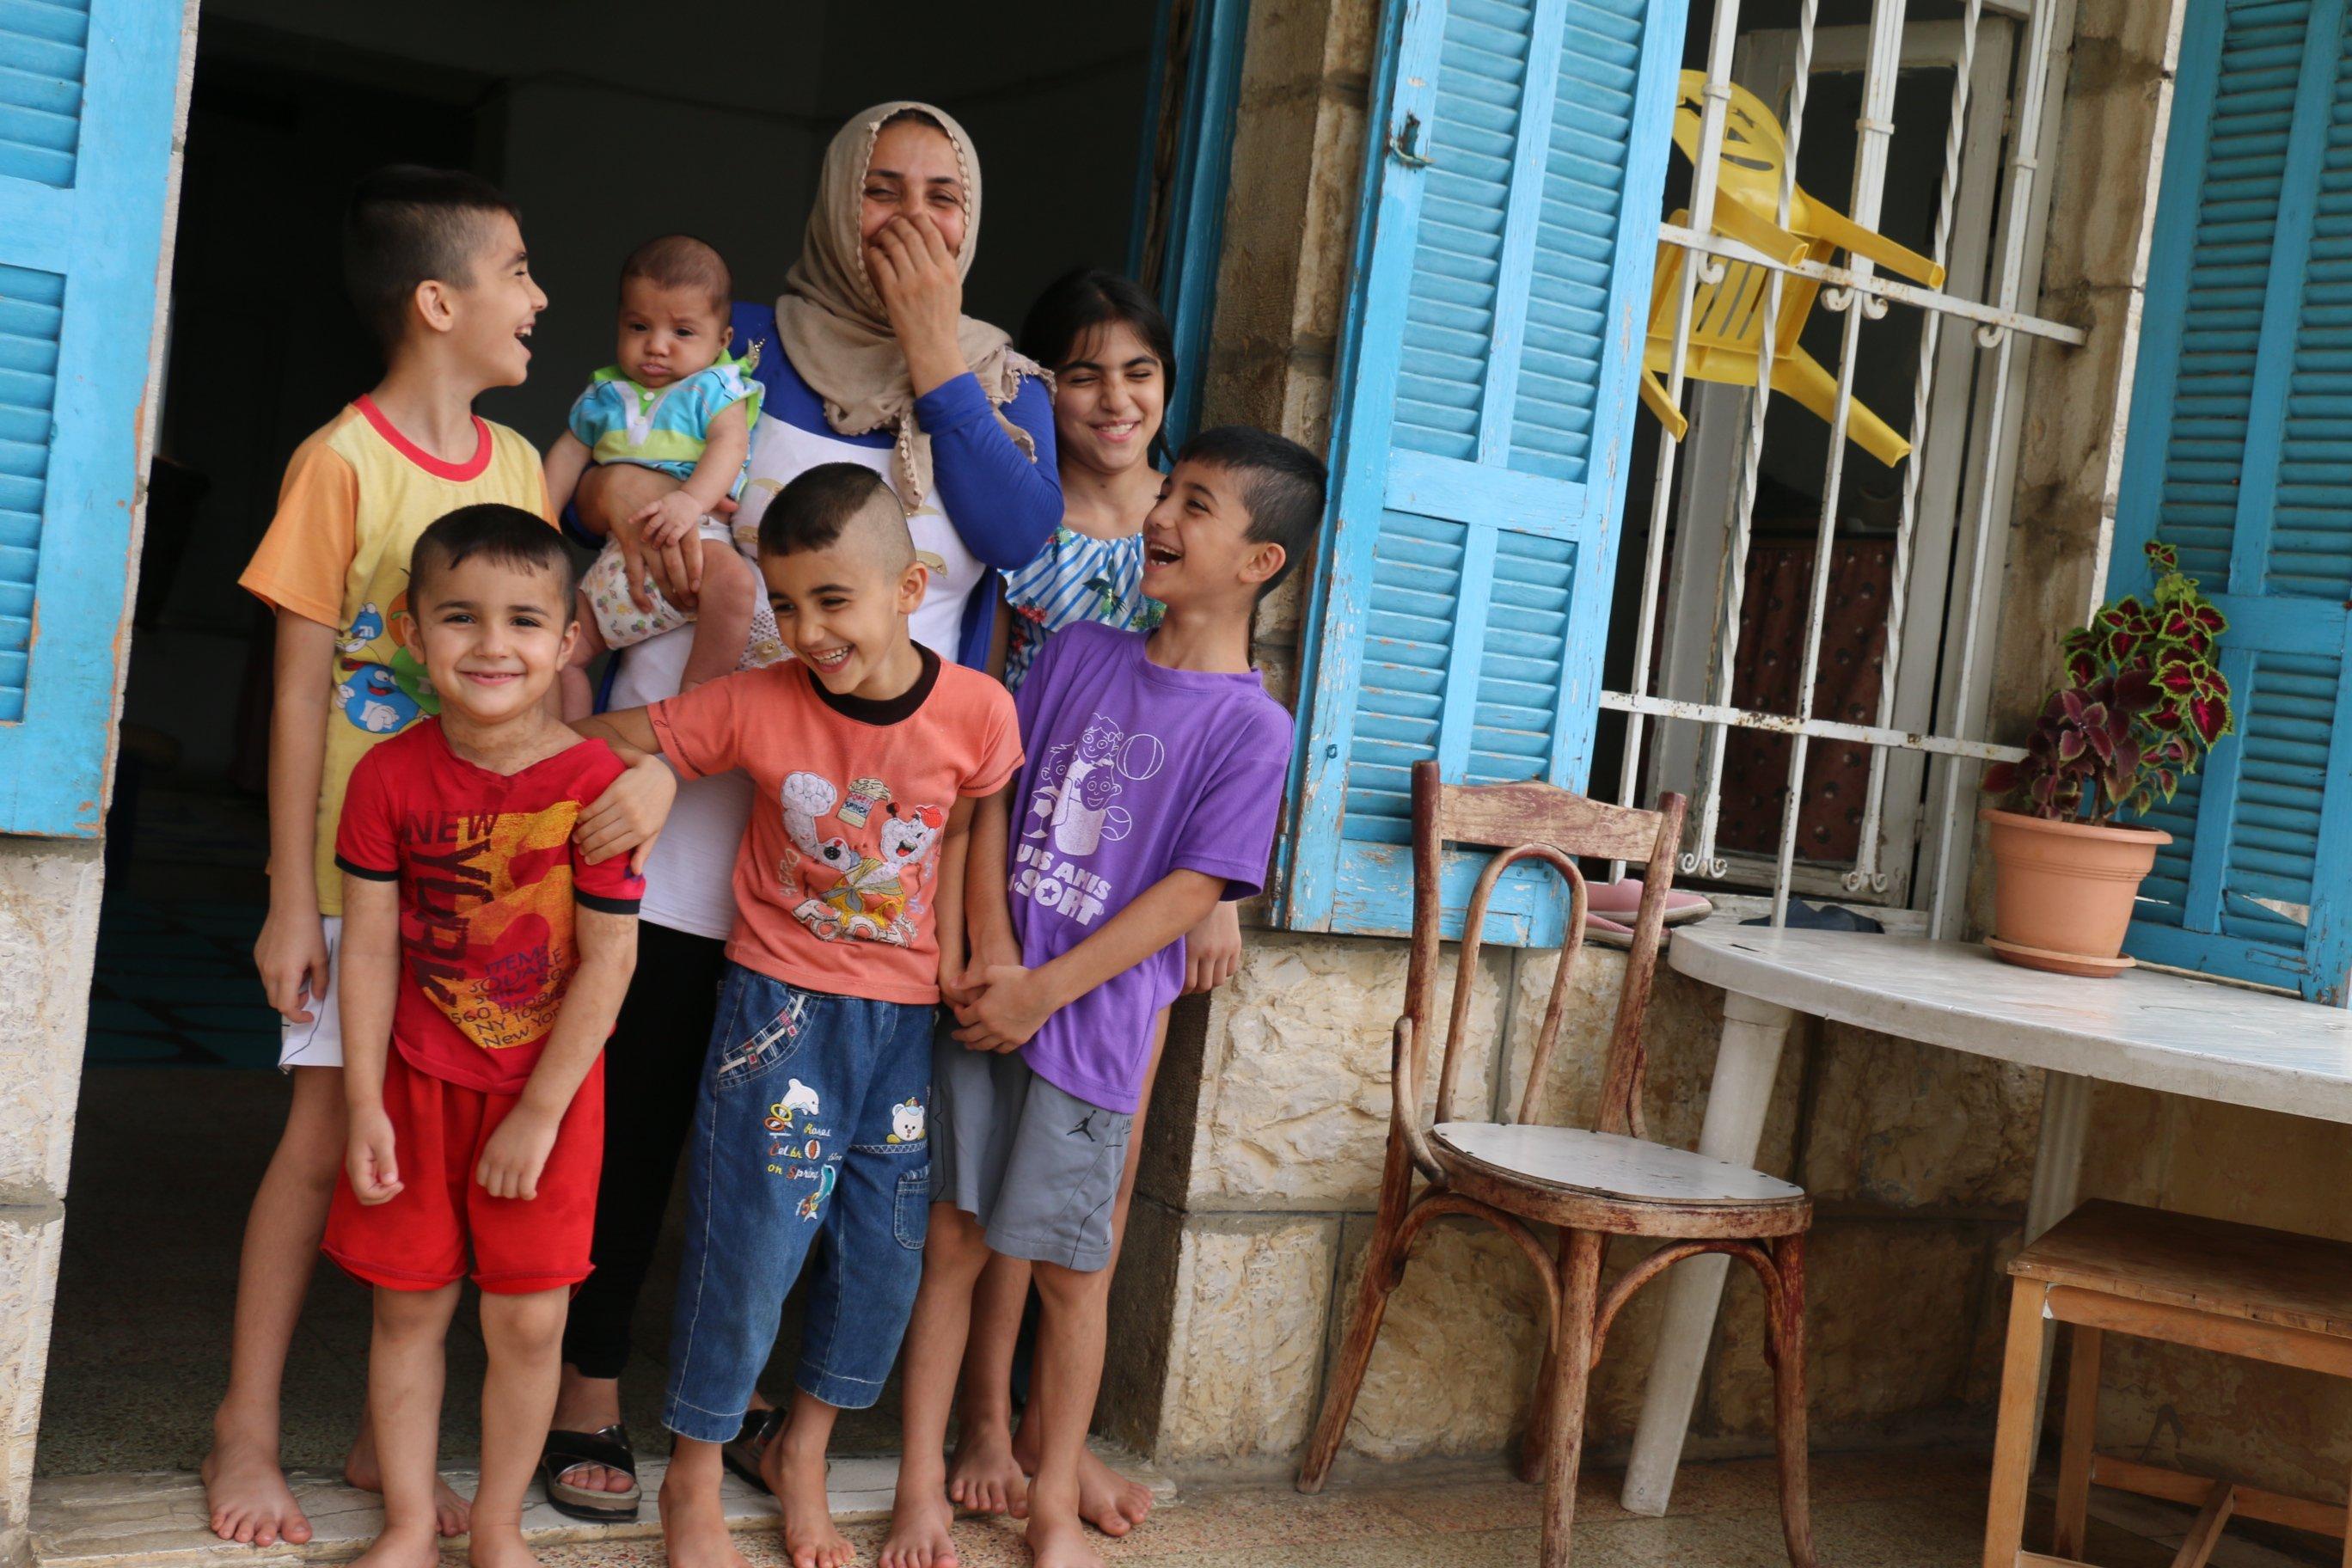 Dalia and Family_Family 4_Syrian refugee family in Leb_11